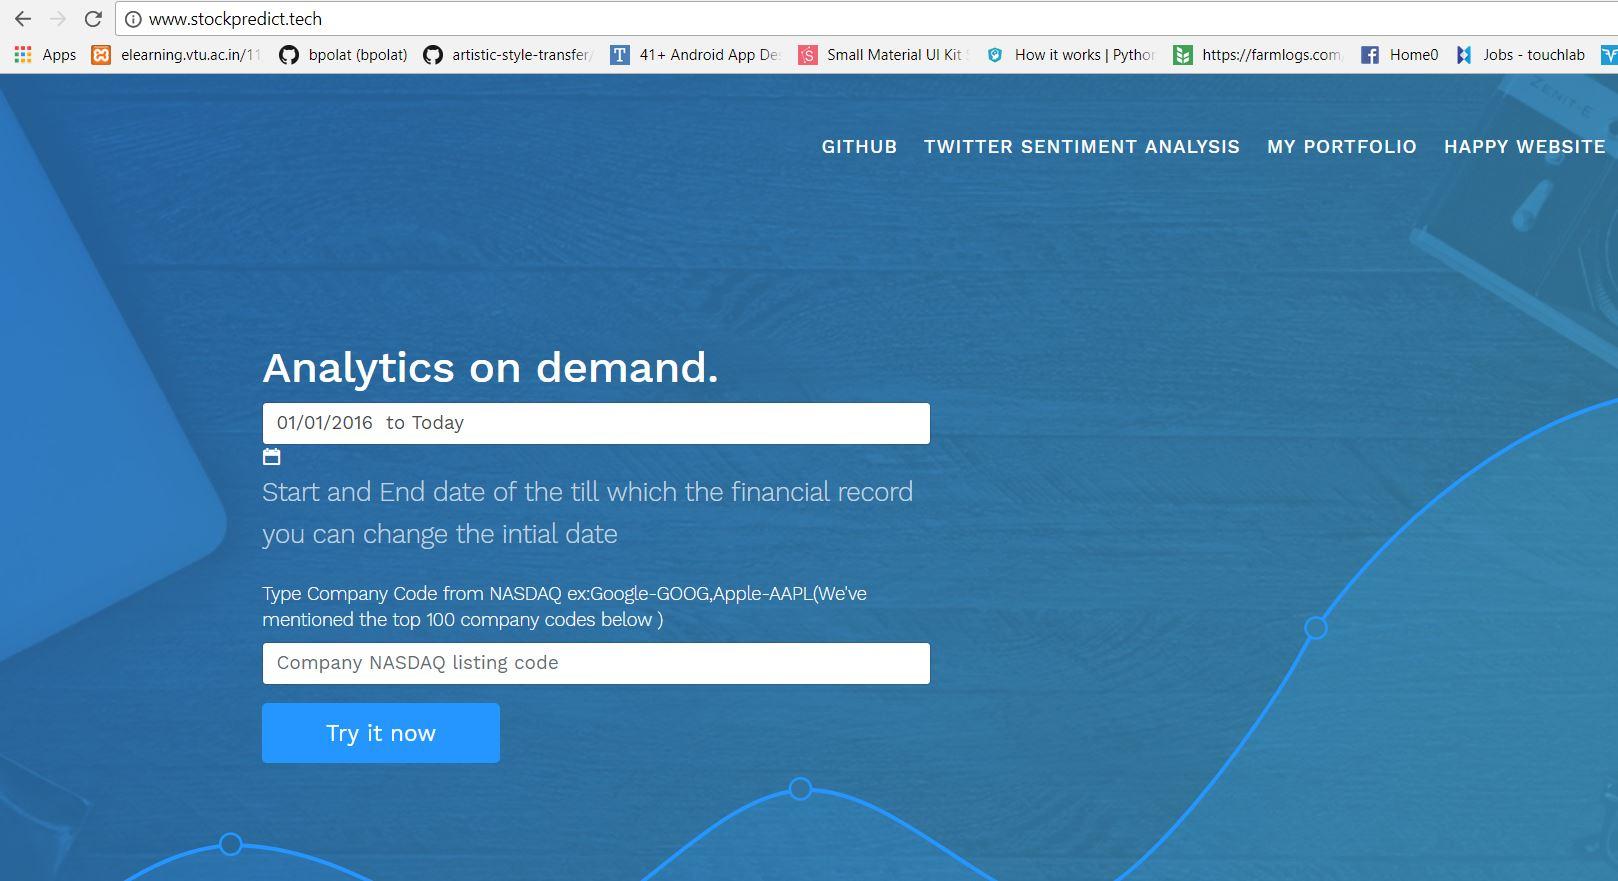 Stock Markets Websites